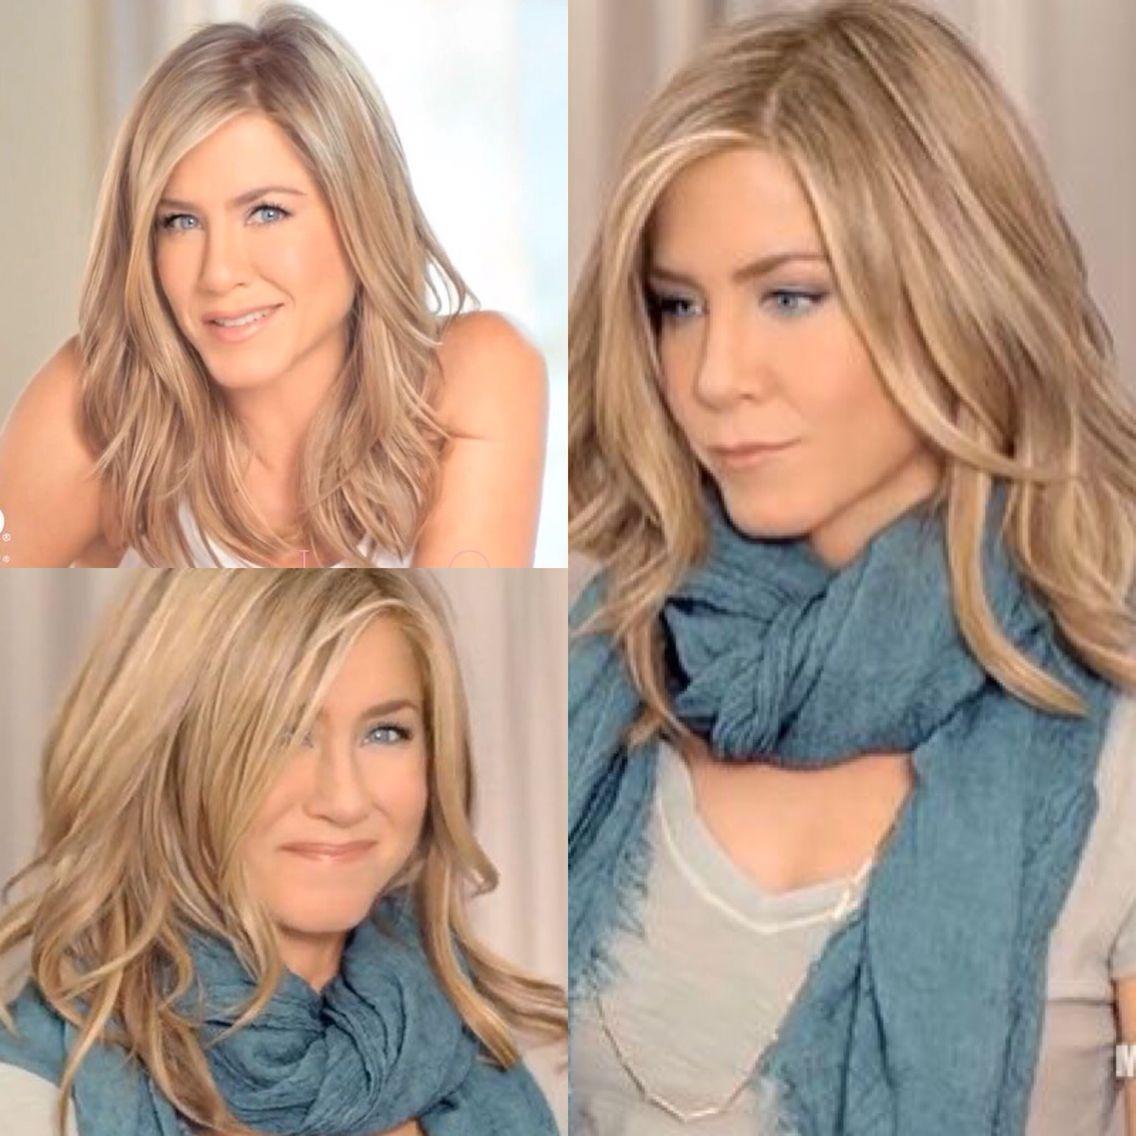 Pin By Jennifer Seefeldt On Lighting: Jennifer Anniston Hair Style Aveeno Commerical. Blonde